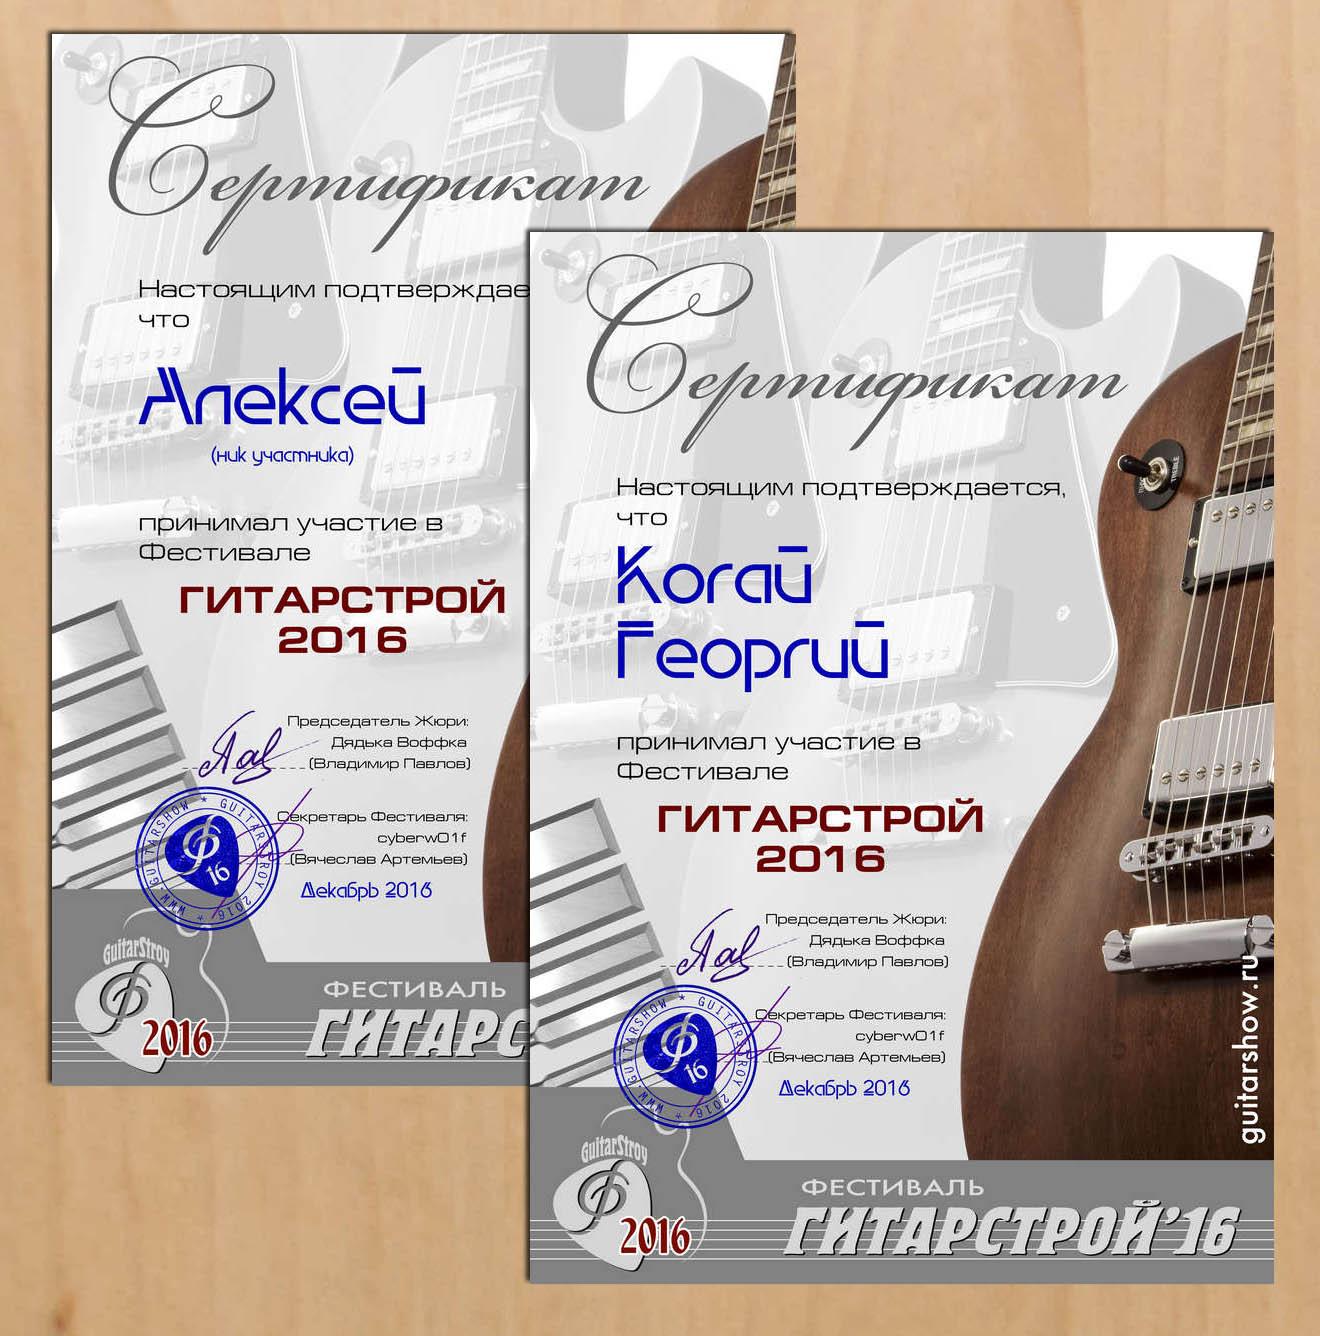 fest16_diplom_certificate